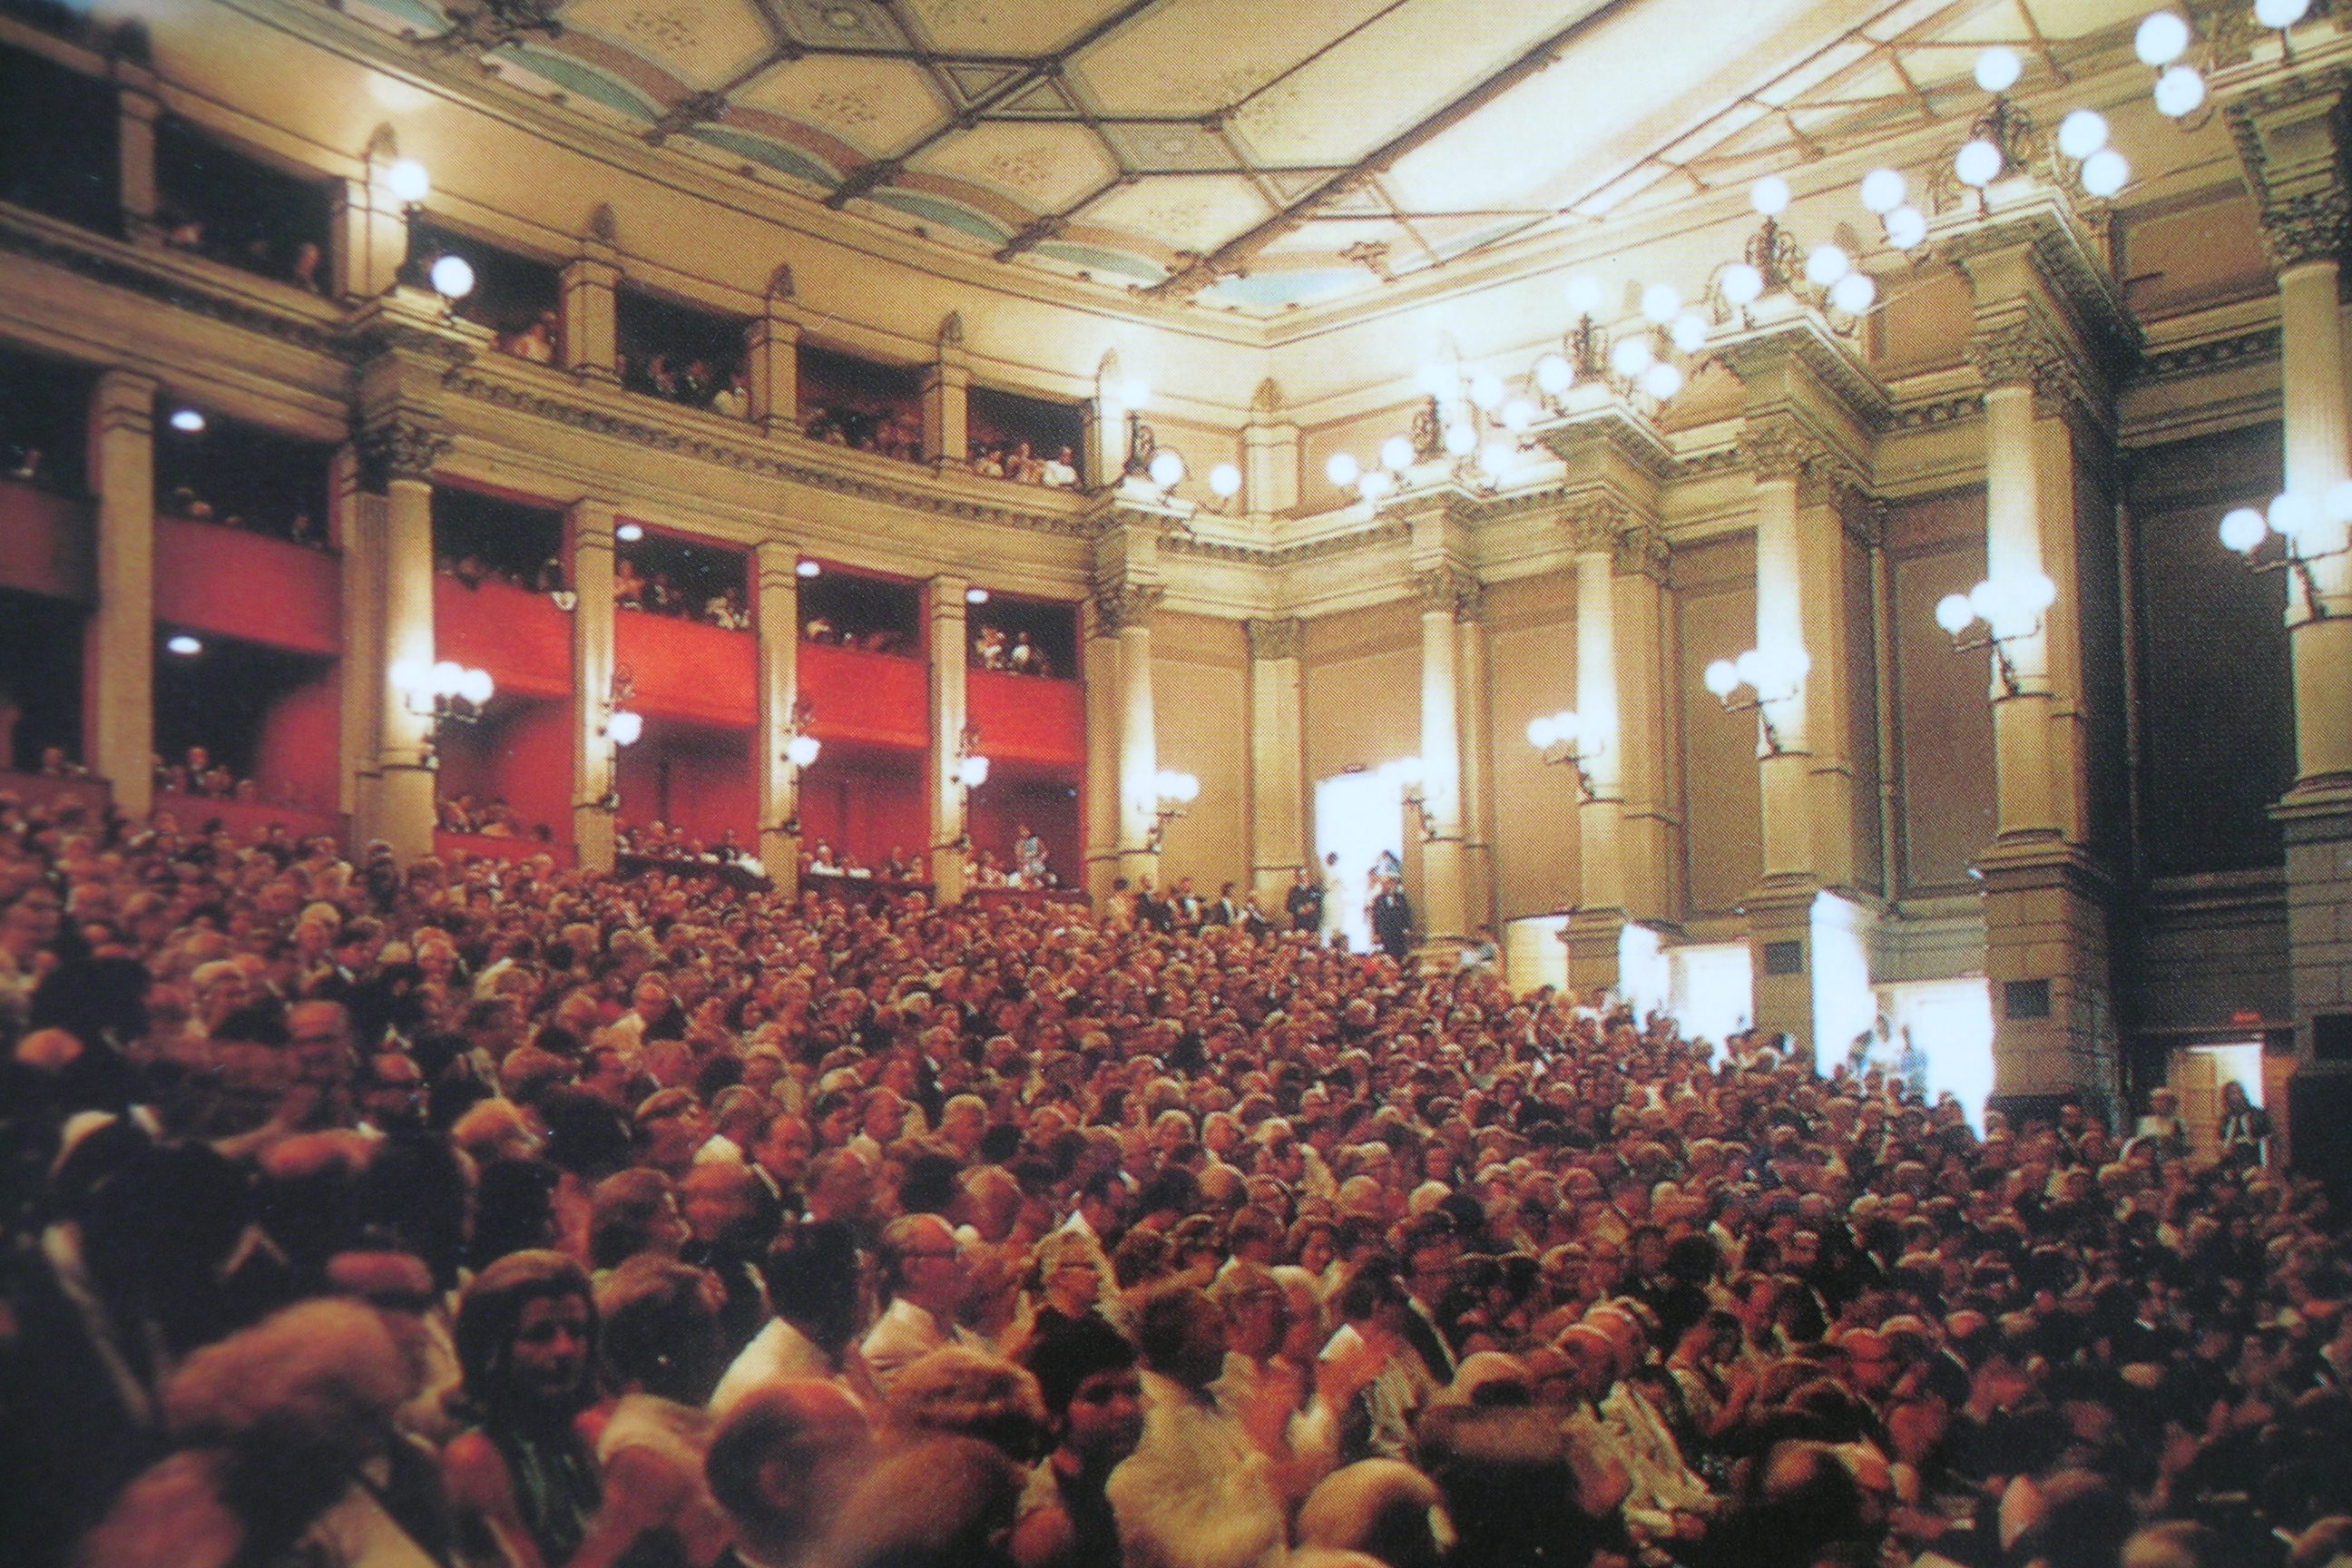 German performance artist out of prestigious Bayreuth Festival